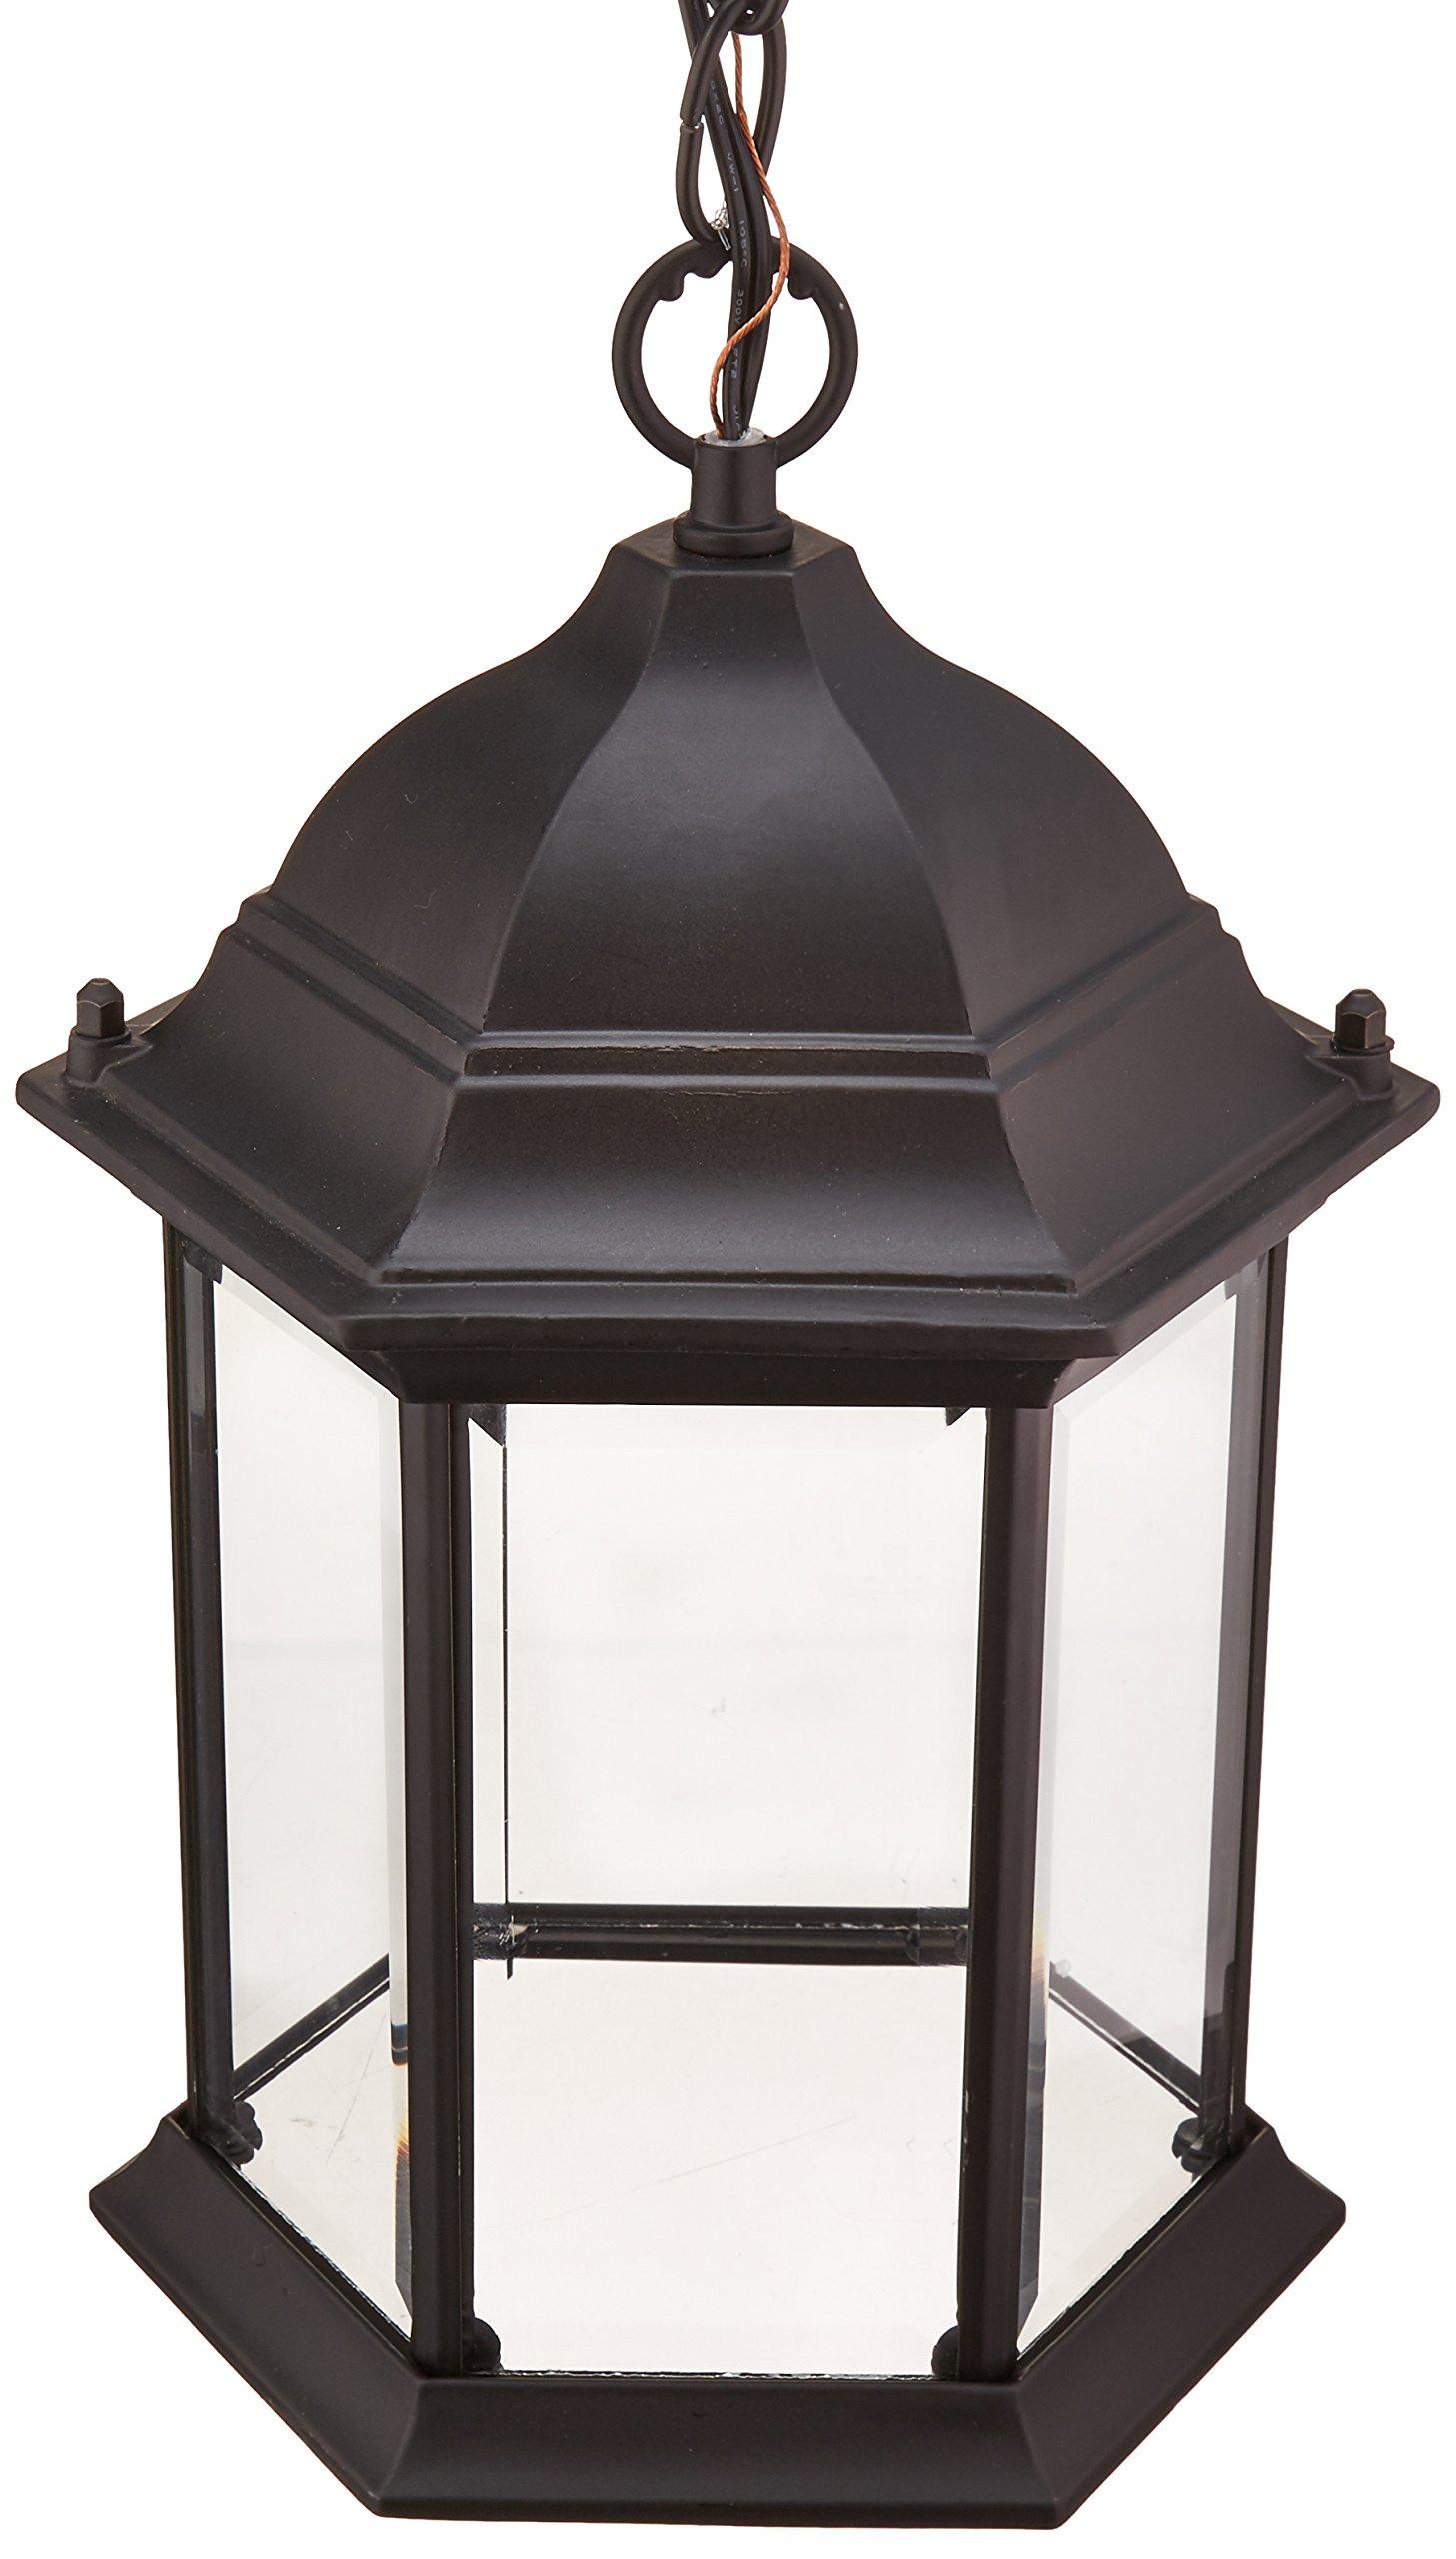 Acclaim 5186BK Madison Collection 1-Light Outdoor Light Fixture Hanging Lantern, Matte Black